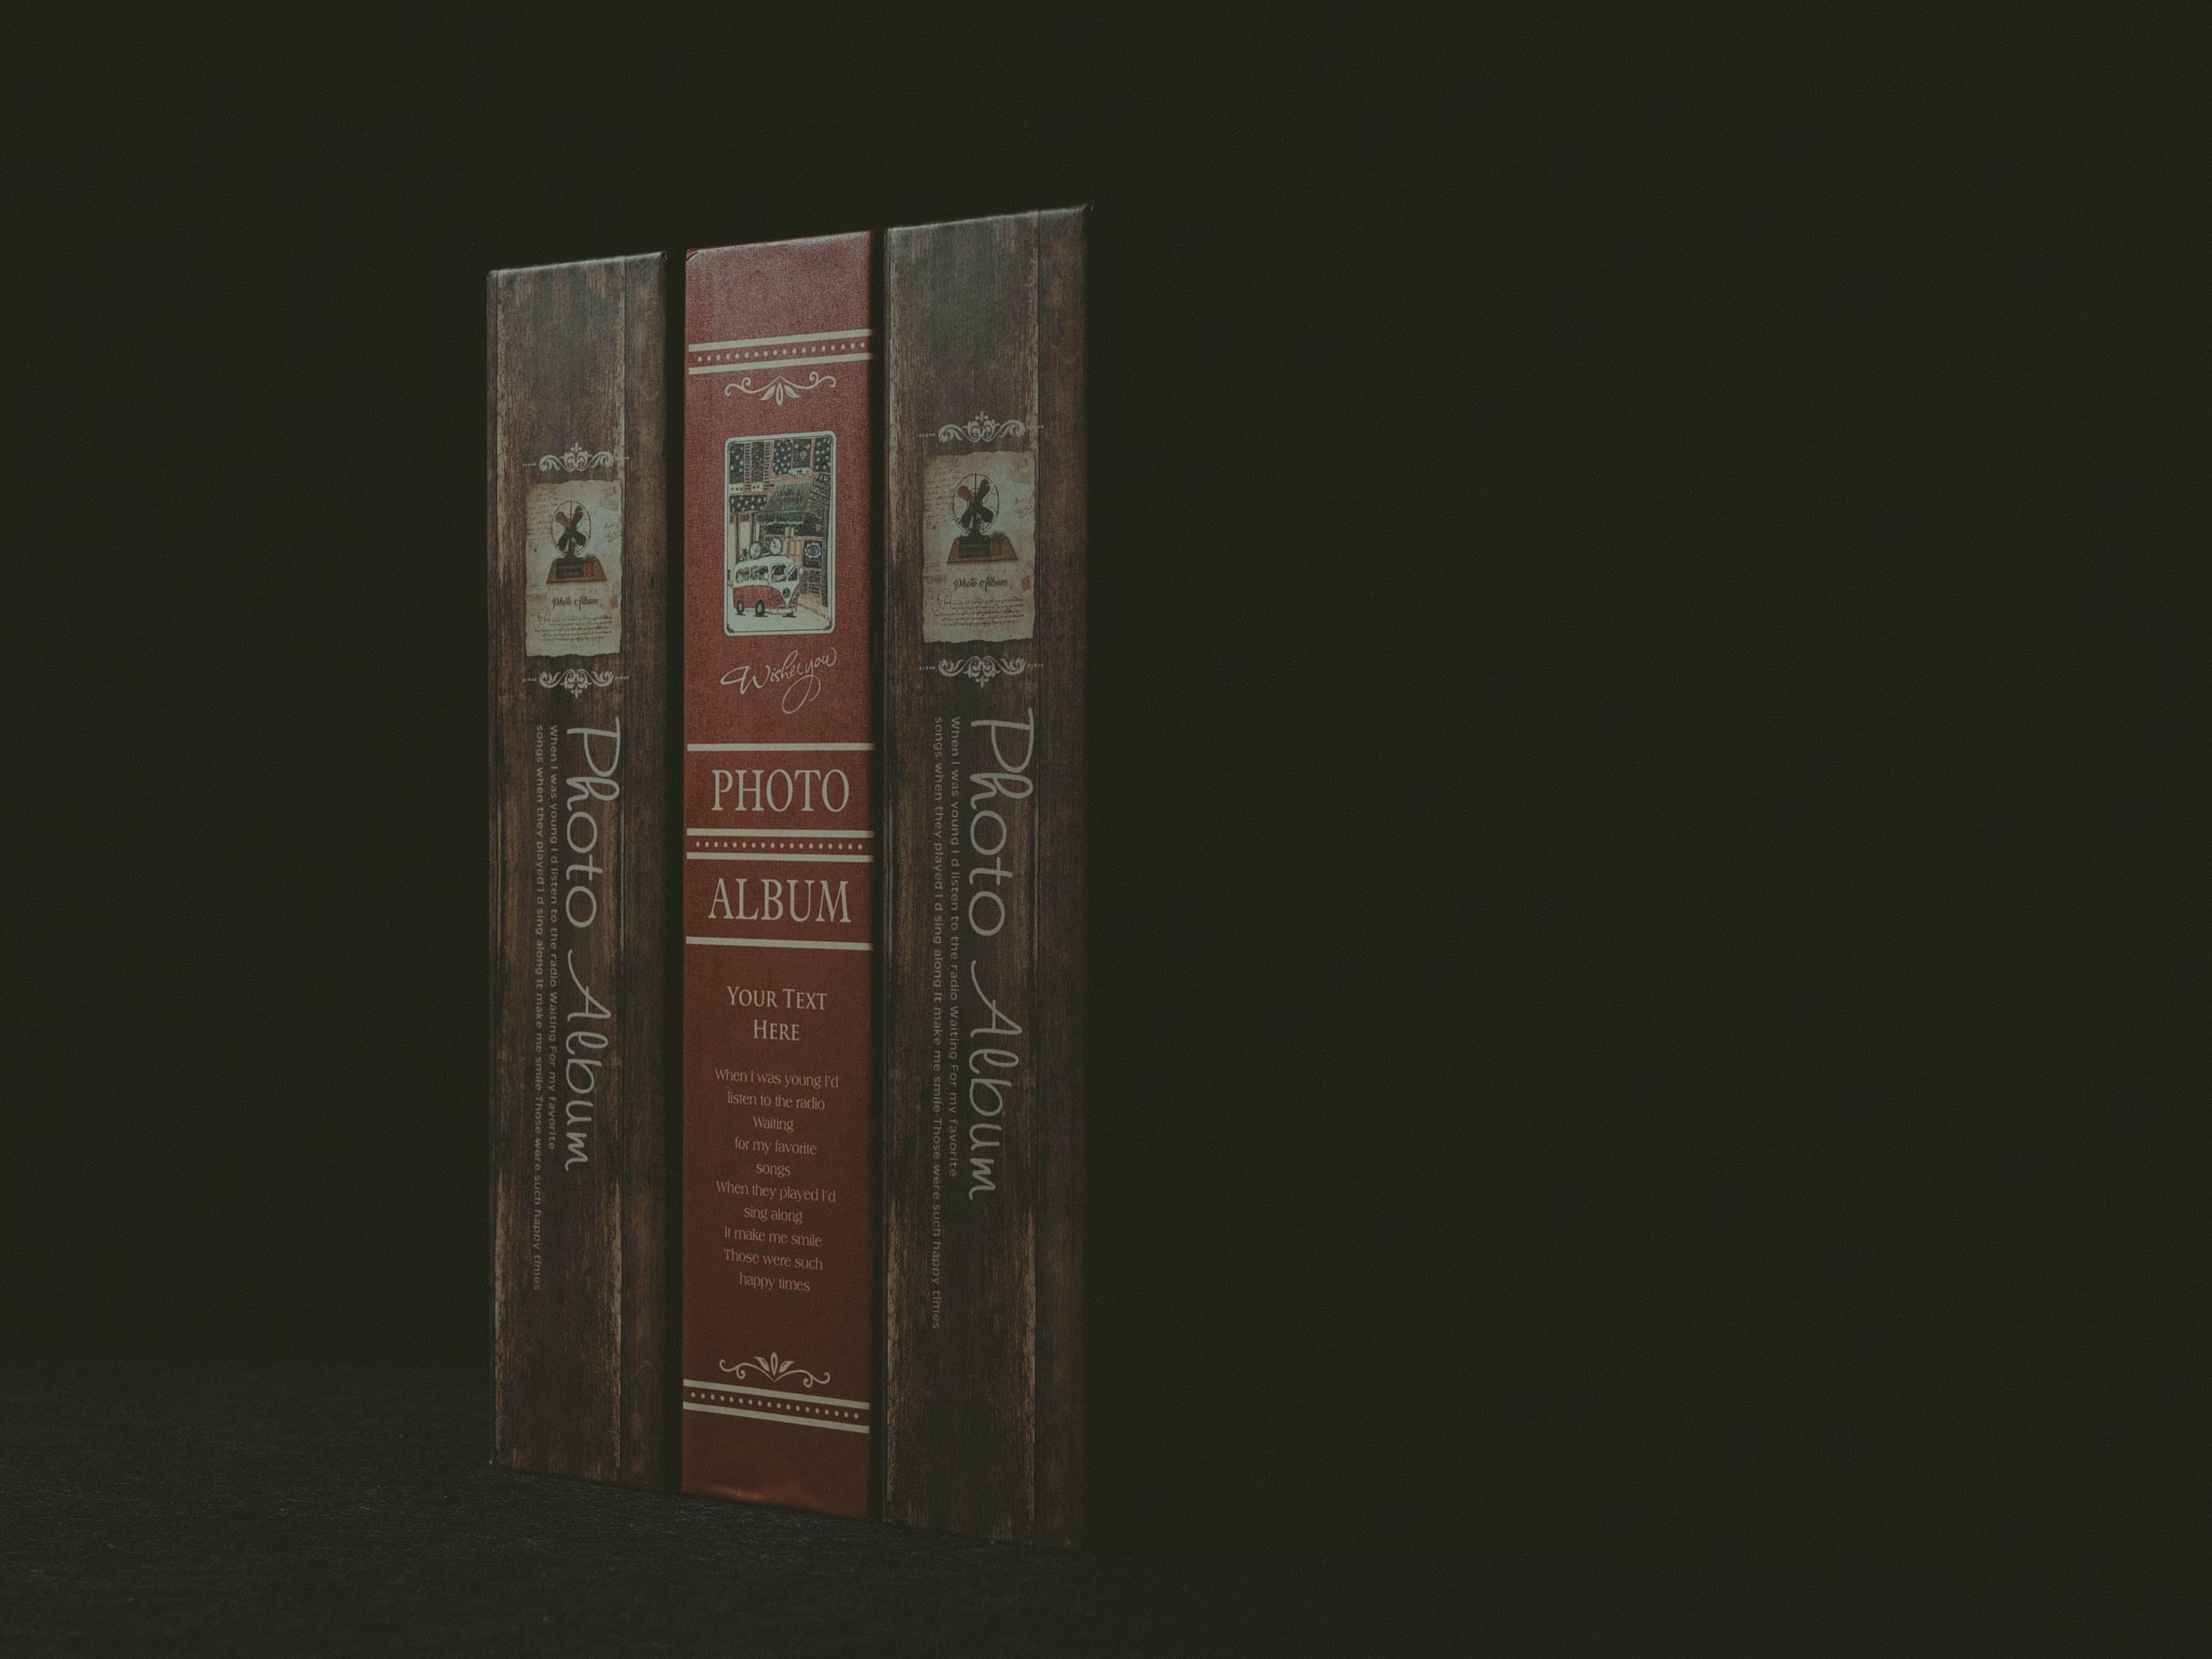 Three Paperback Books on Black Surface